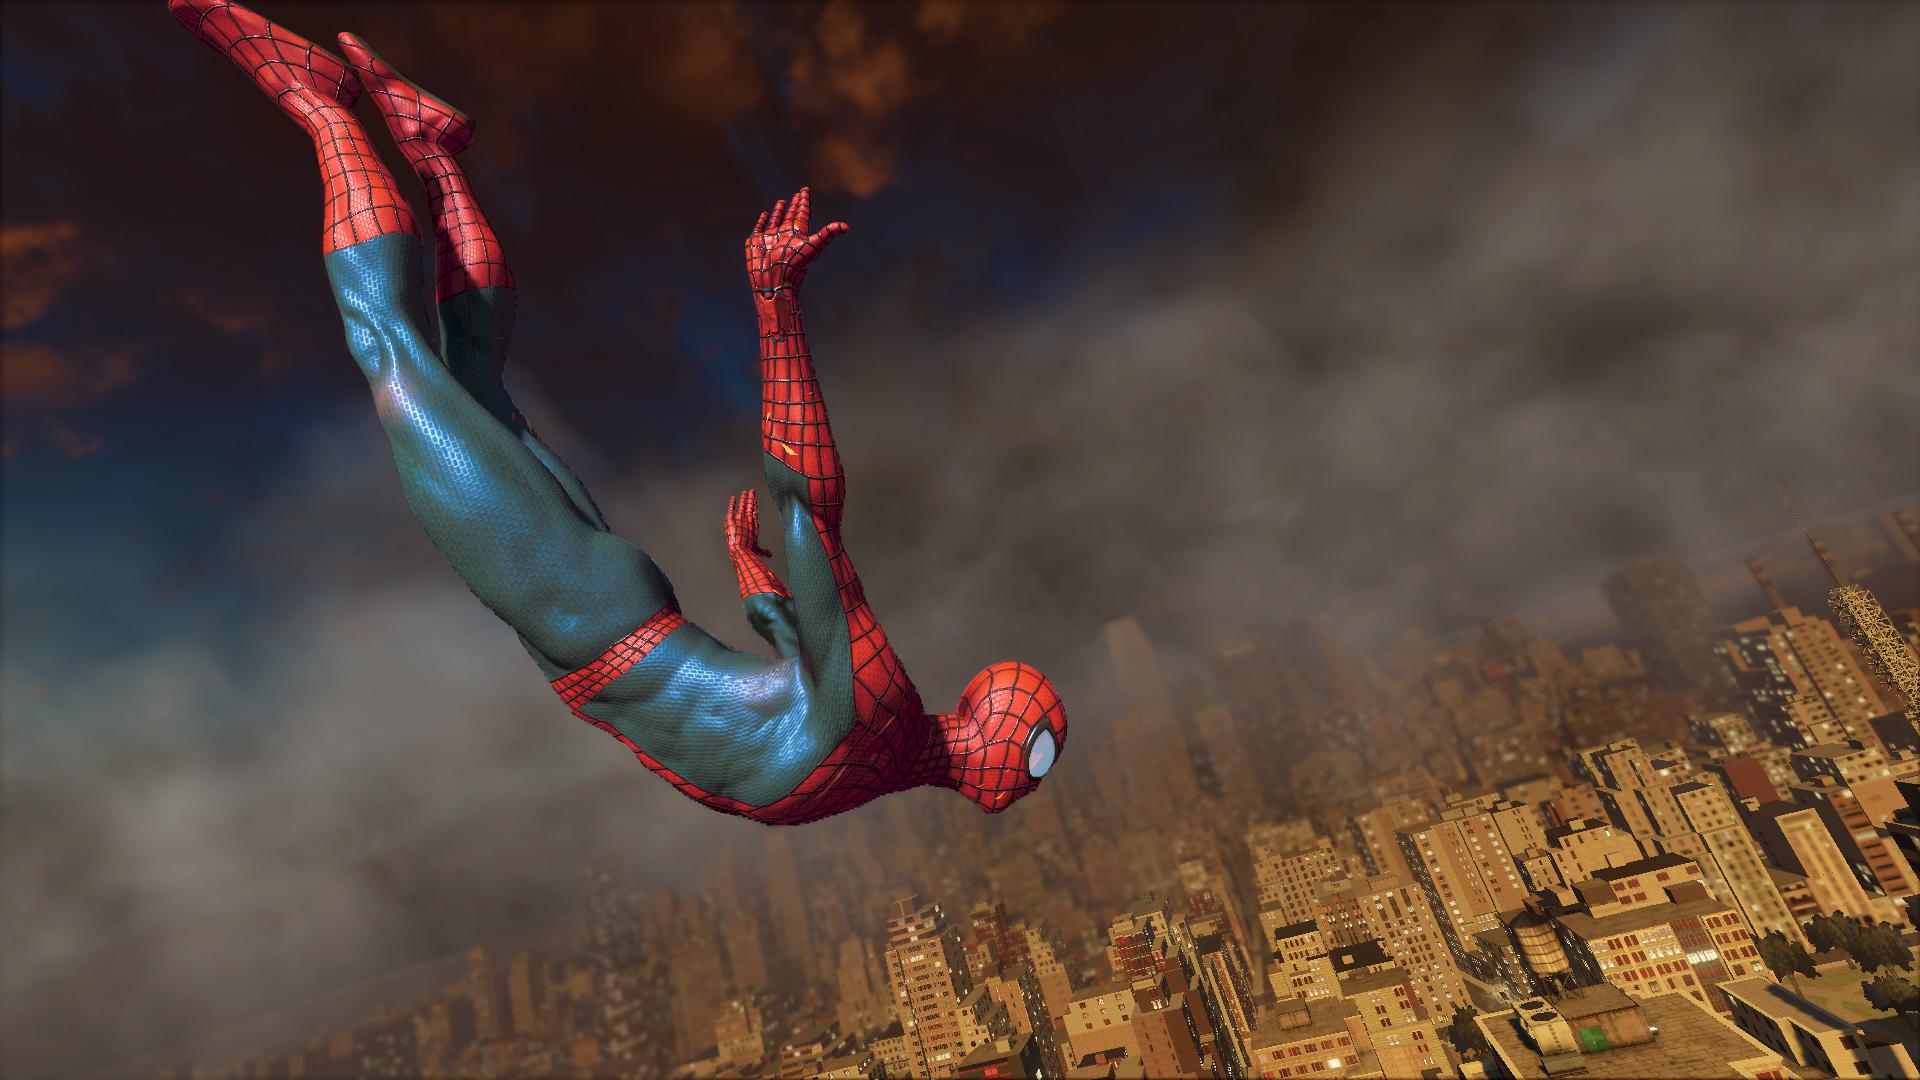 amazing spider man 2 footage shows web swinging combat. Black Bedroom Furniture Sets. Home Design Ideas